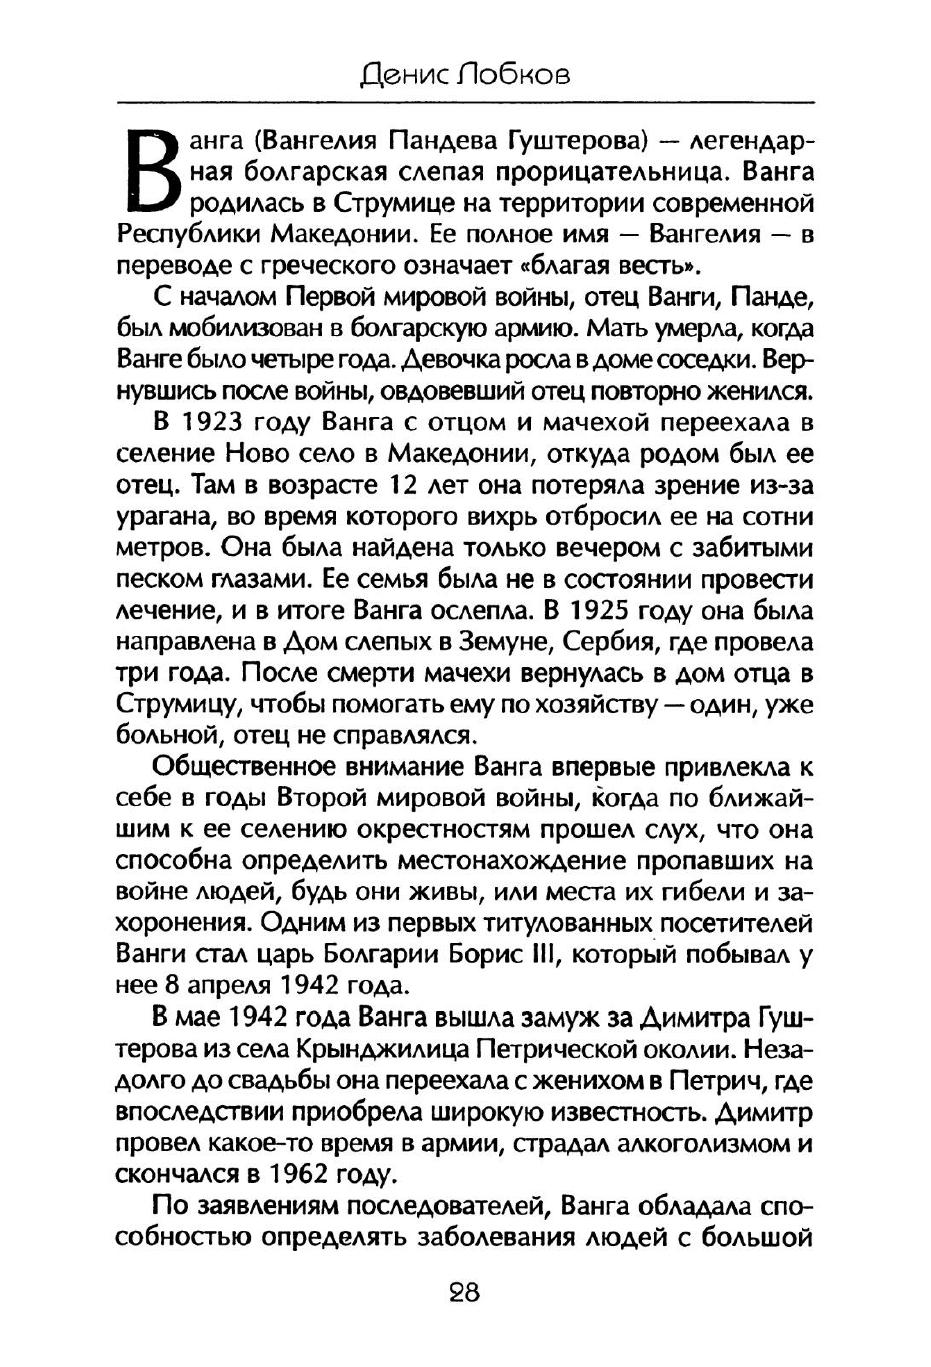 http://images.vfl.ru/ii/1407266719/046abb45/5908735.jpg